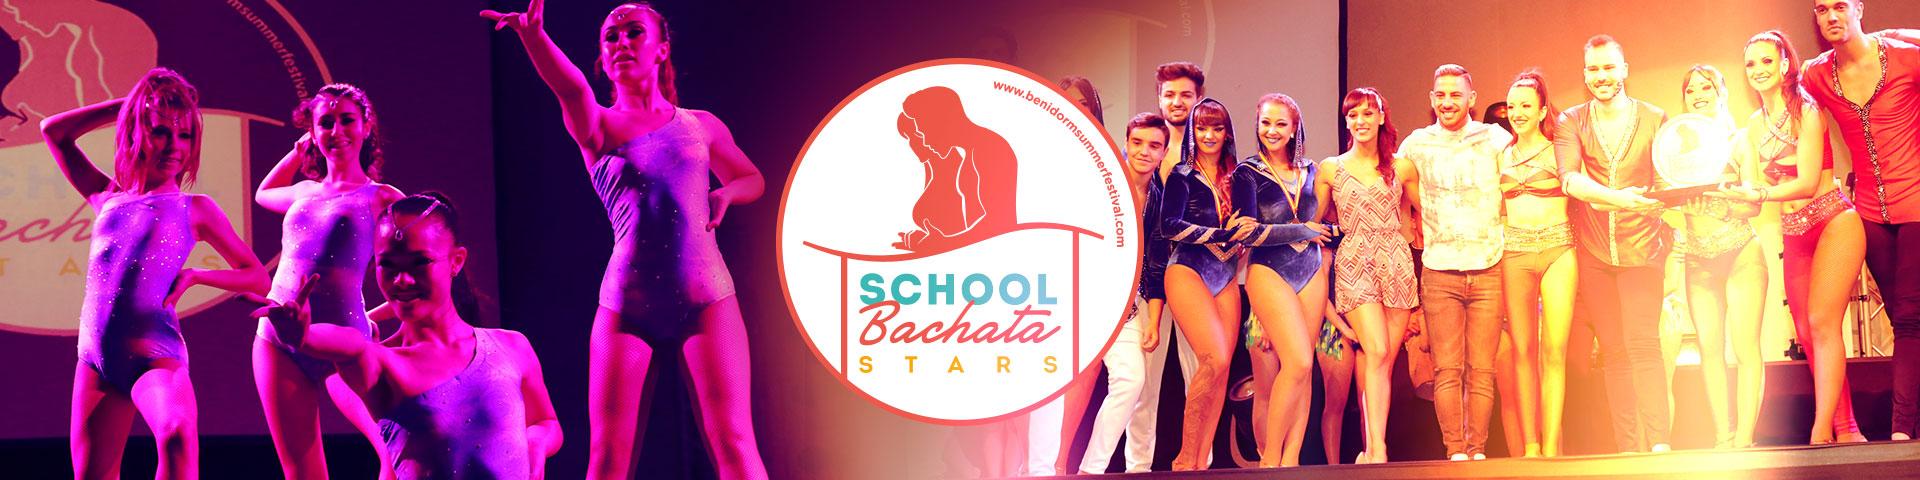 School Bachata Star